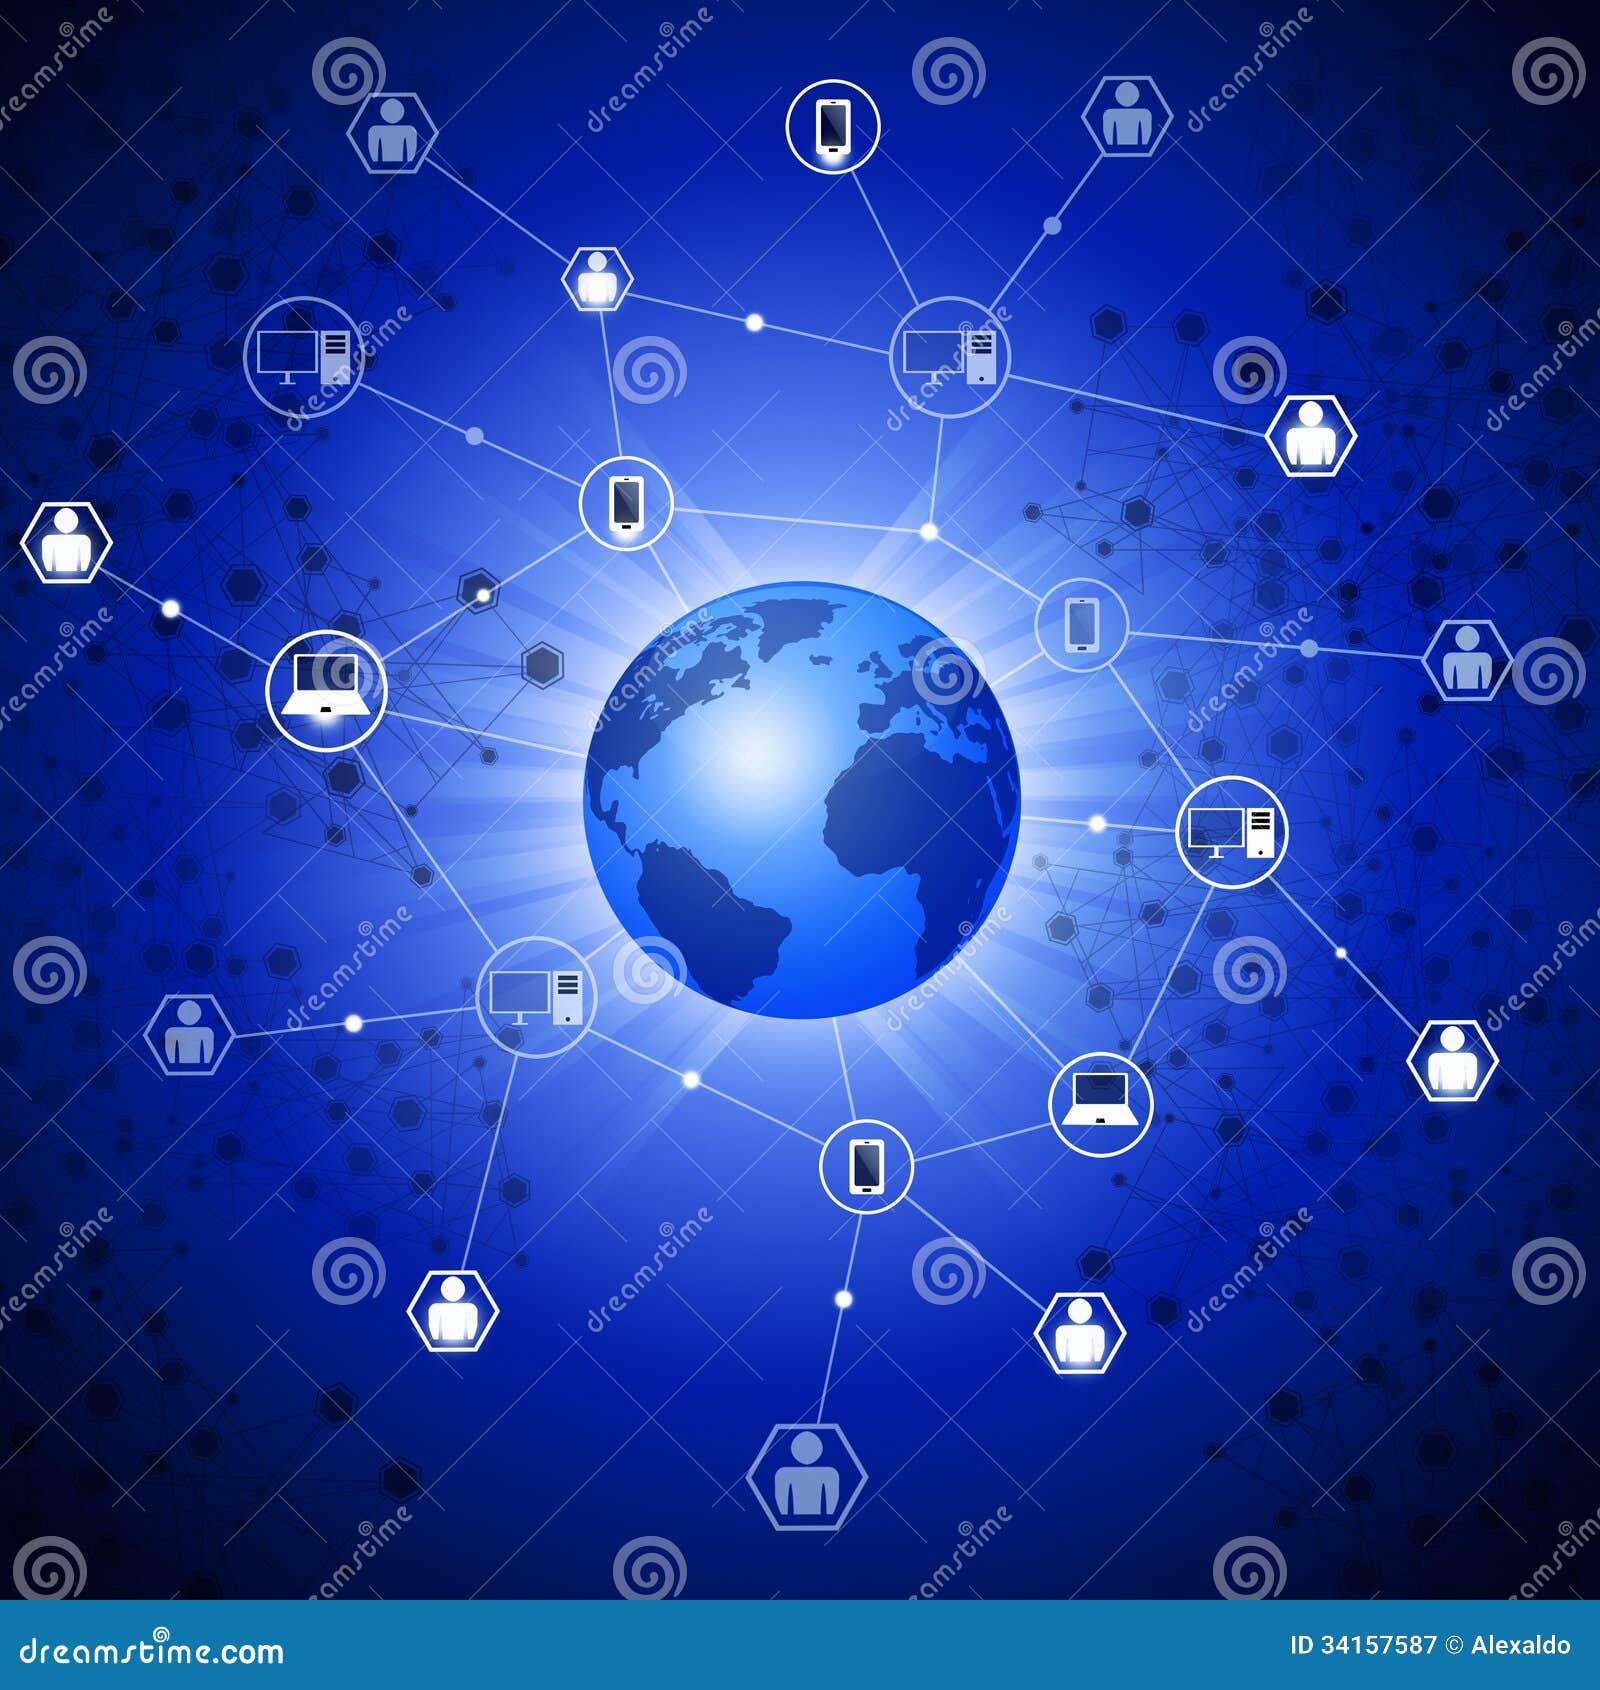 internet homepage wallpaper - photo #29